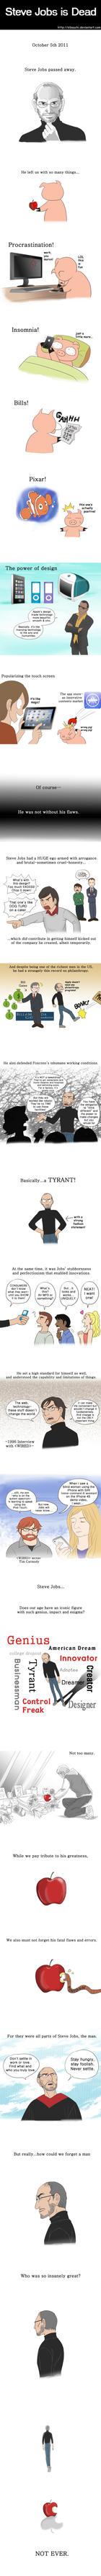 Steve Jobs is Dead: a Webcomic by Sibauchi